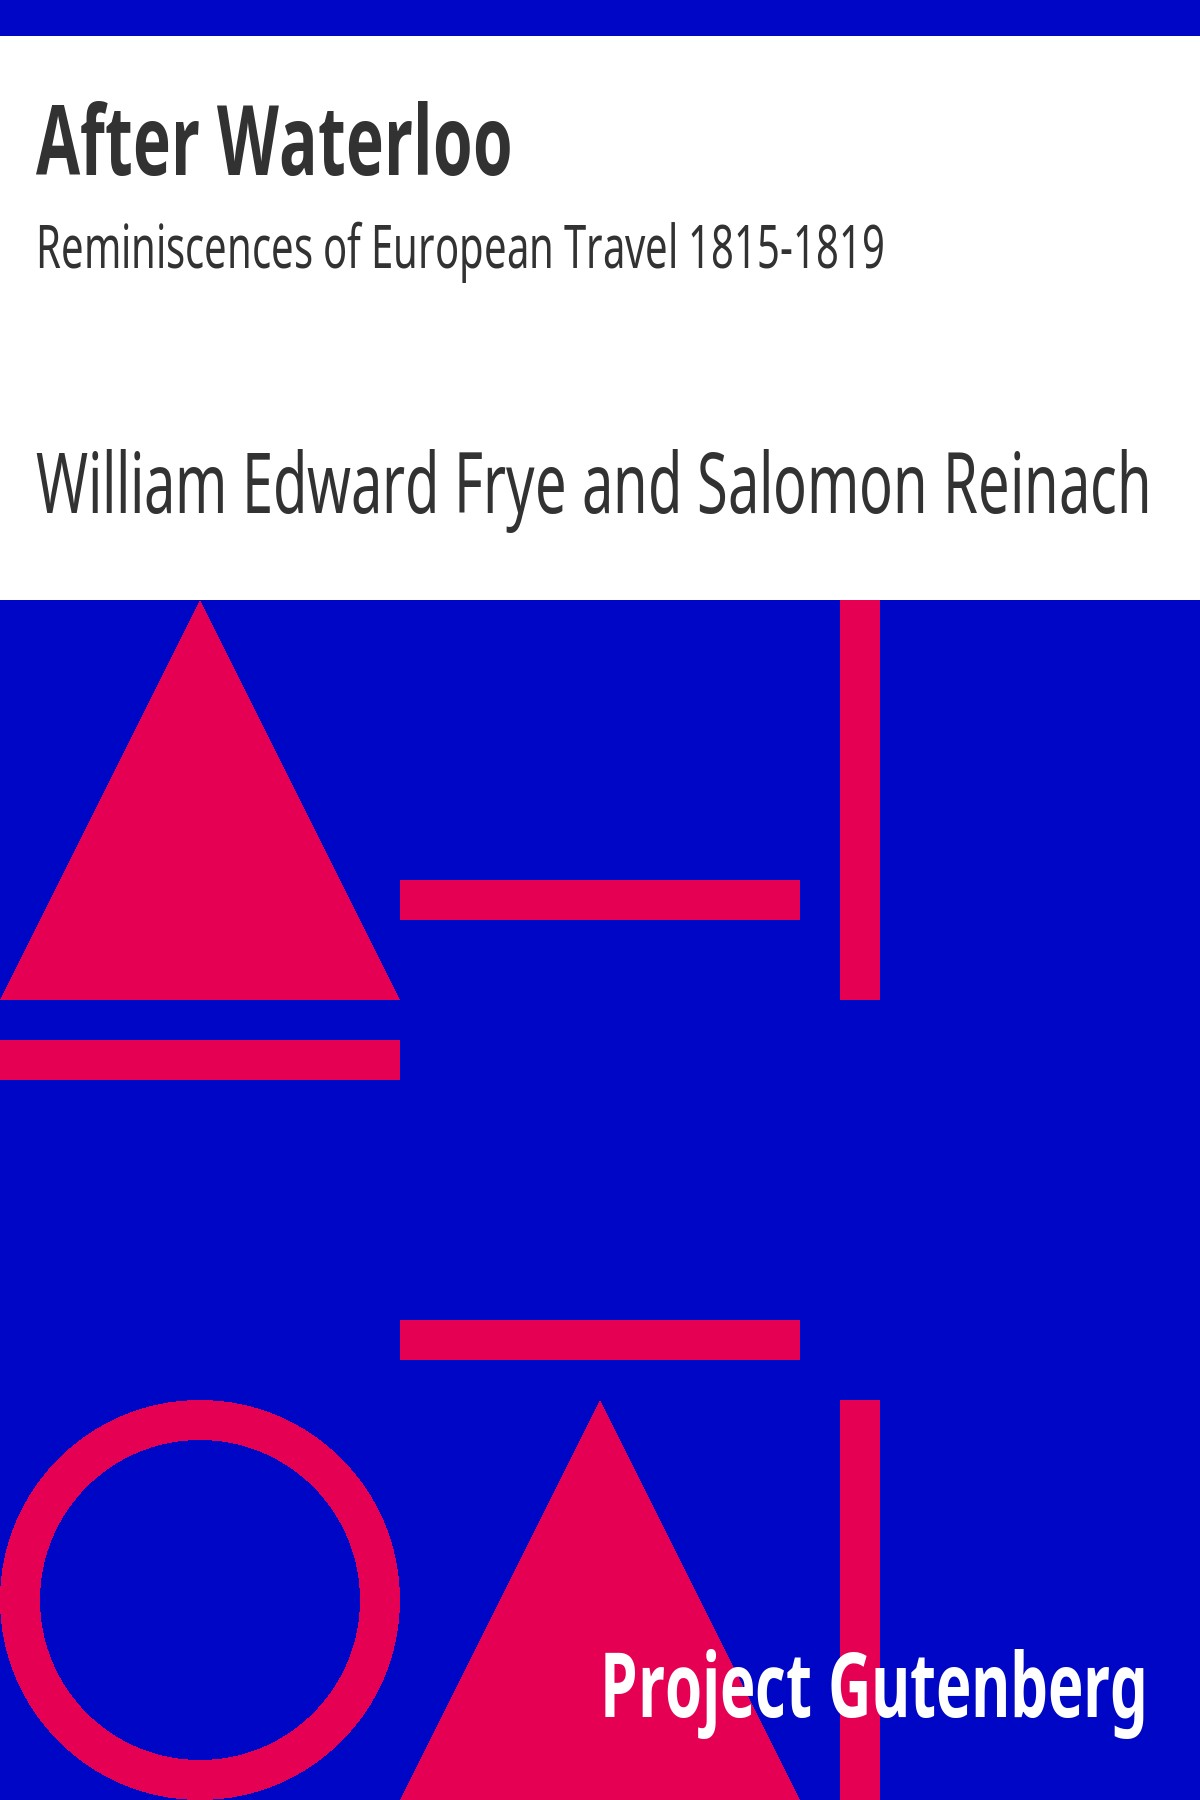 William Edward Frye After Waterloo: Reminiscences of European Travel 1815-1819